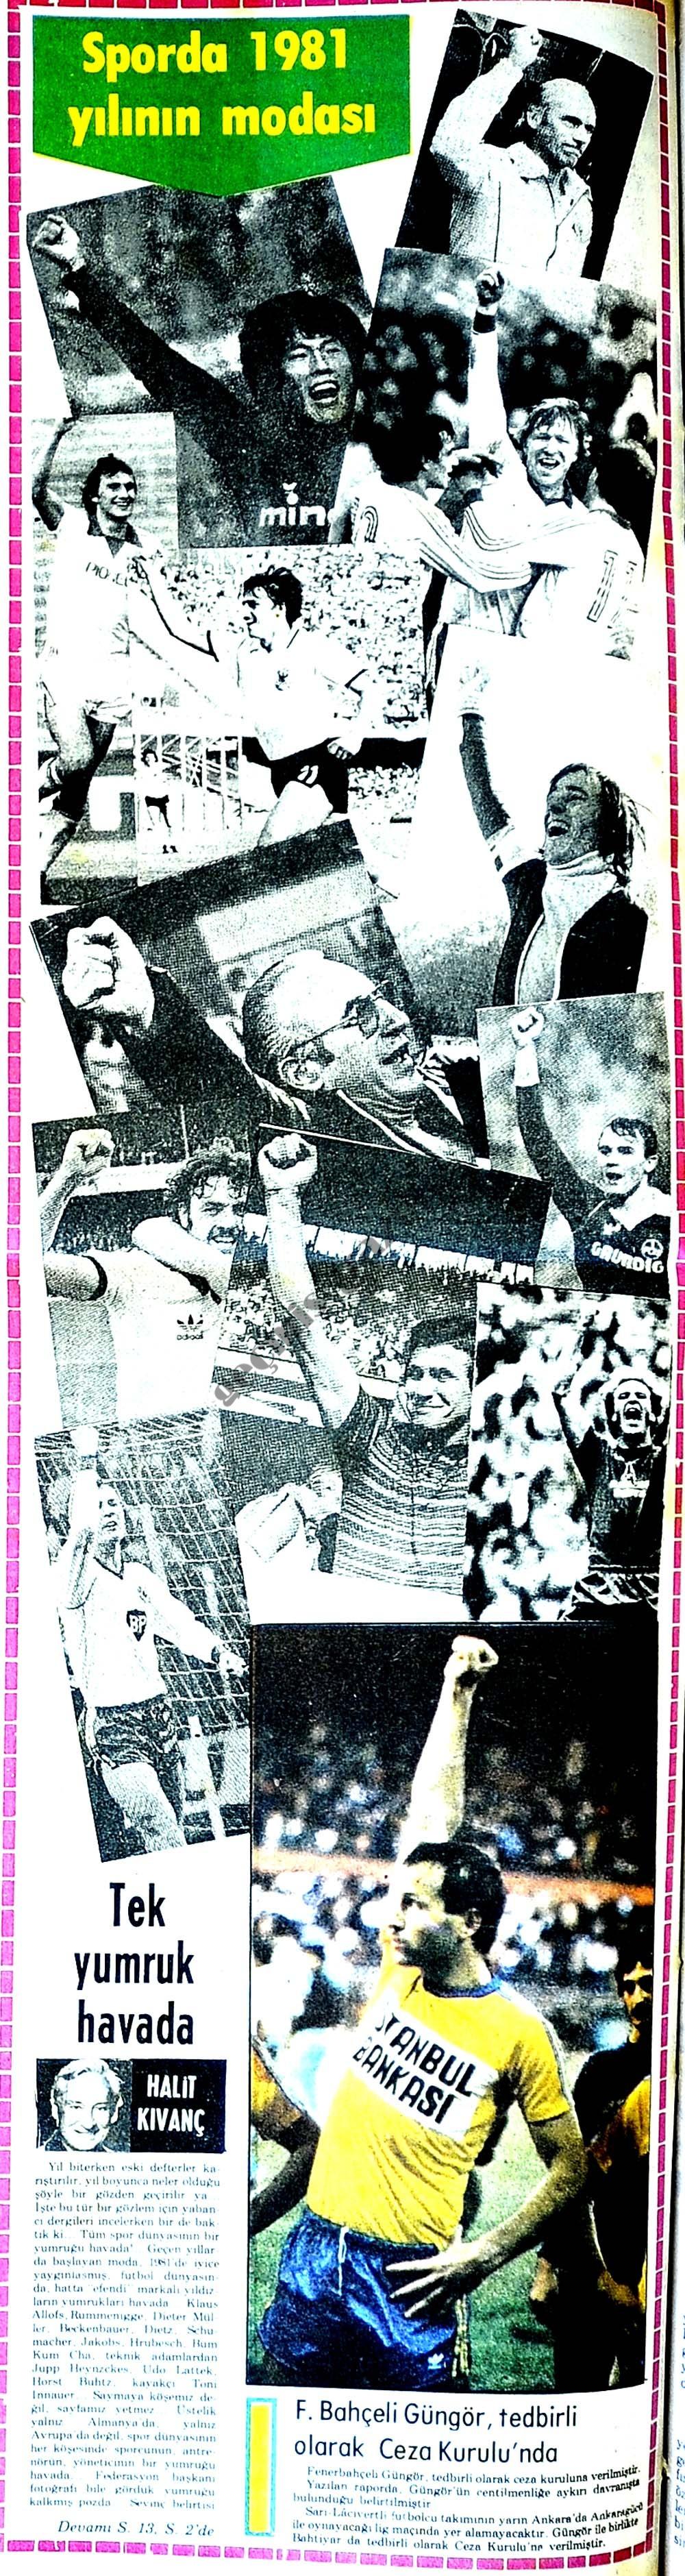 Sporda 1981 yılının modası